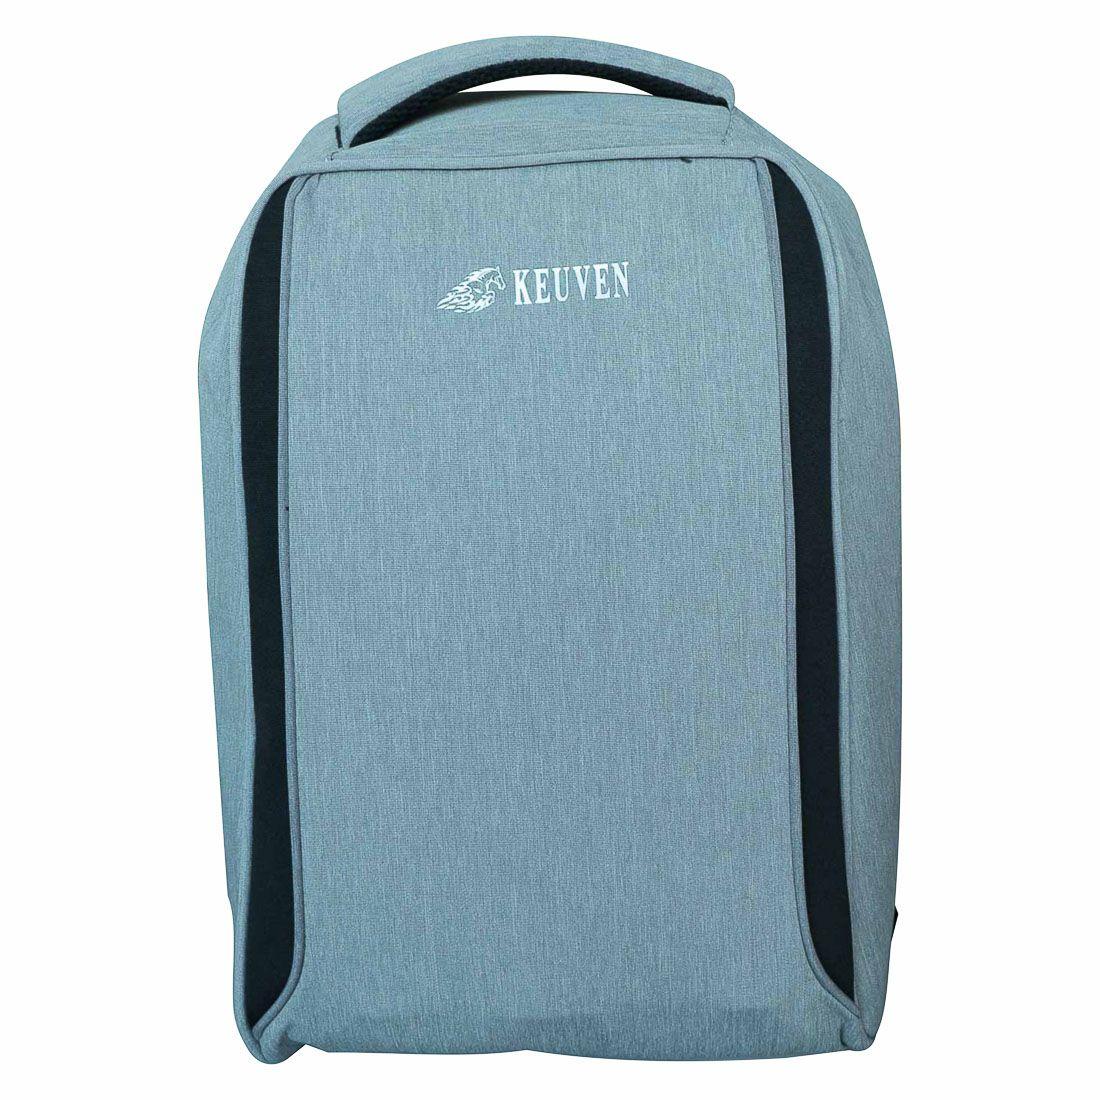 Mochila Para Notebook Keuven Anti Furto 72828